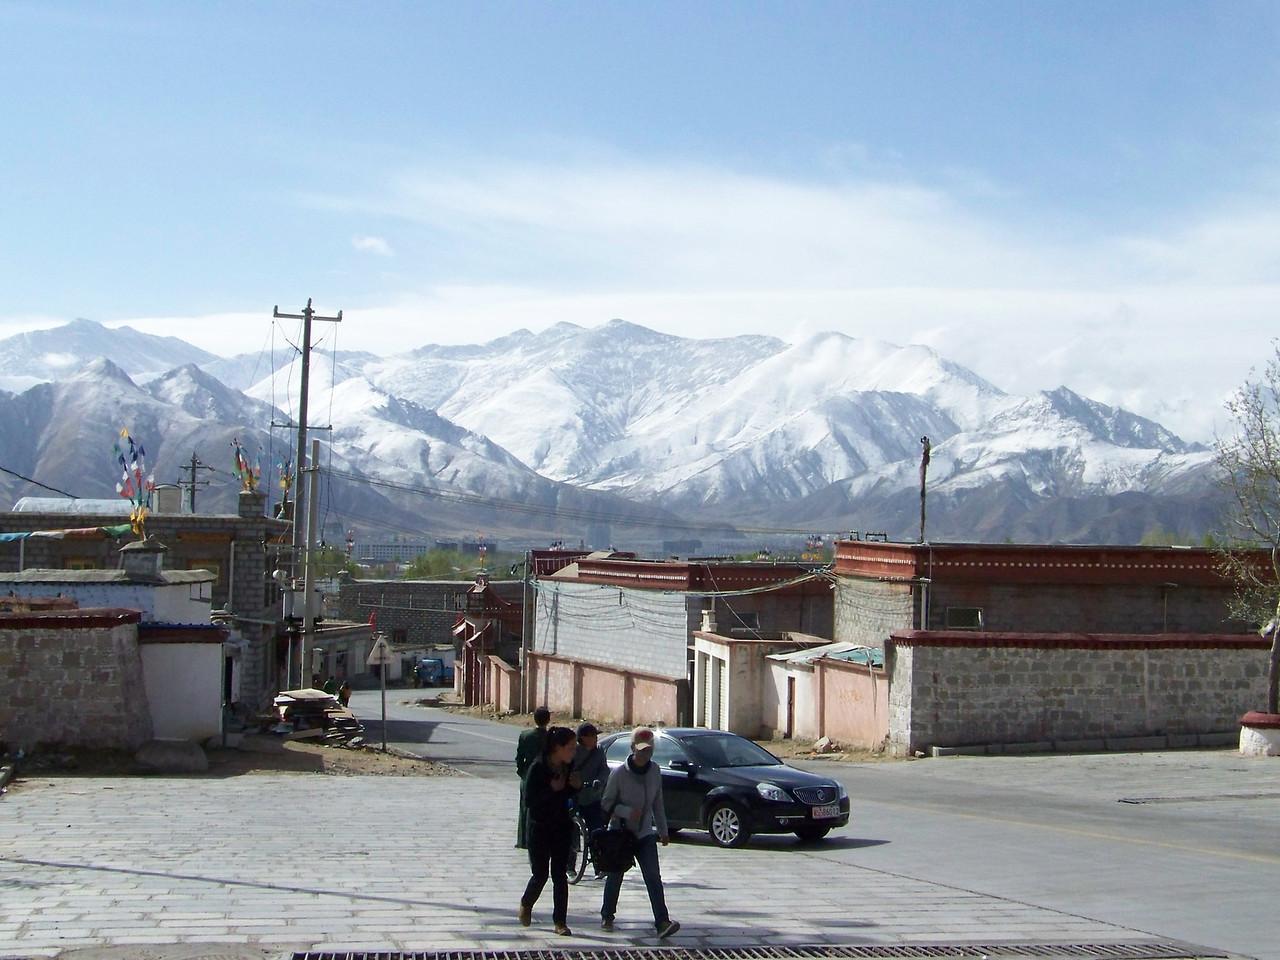 0128 - Entrance to Deprung Monastery - Lhasa Tibet.JPG